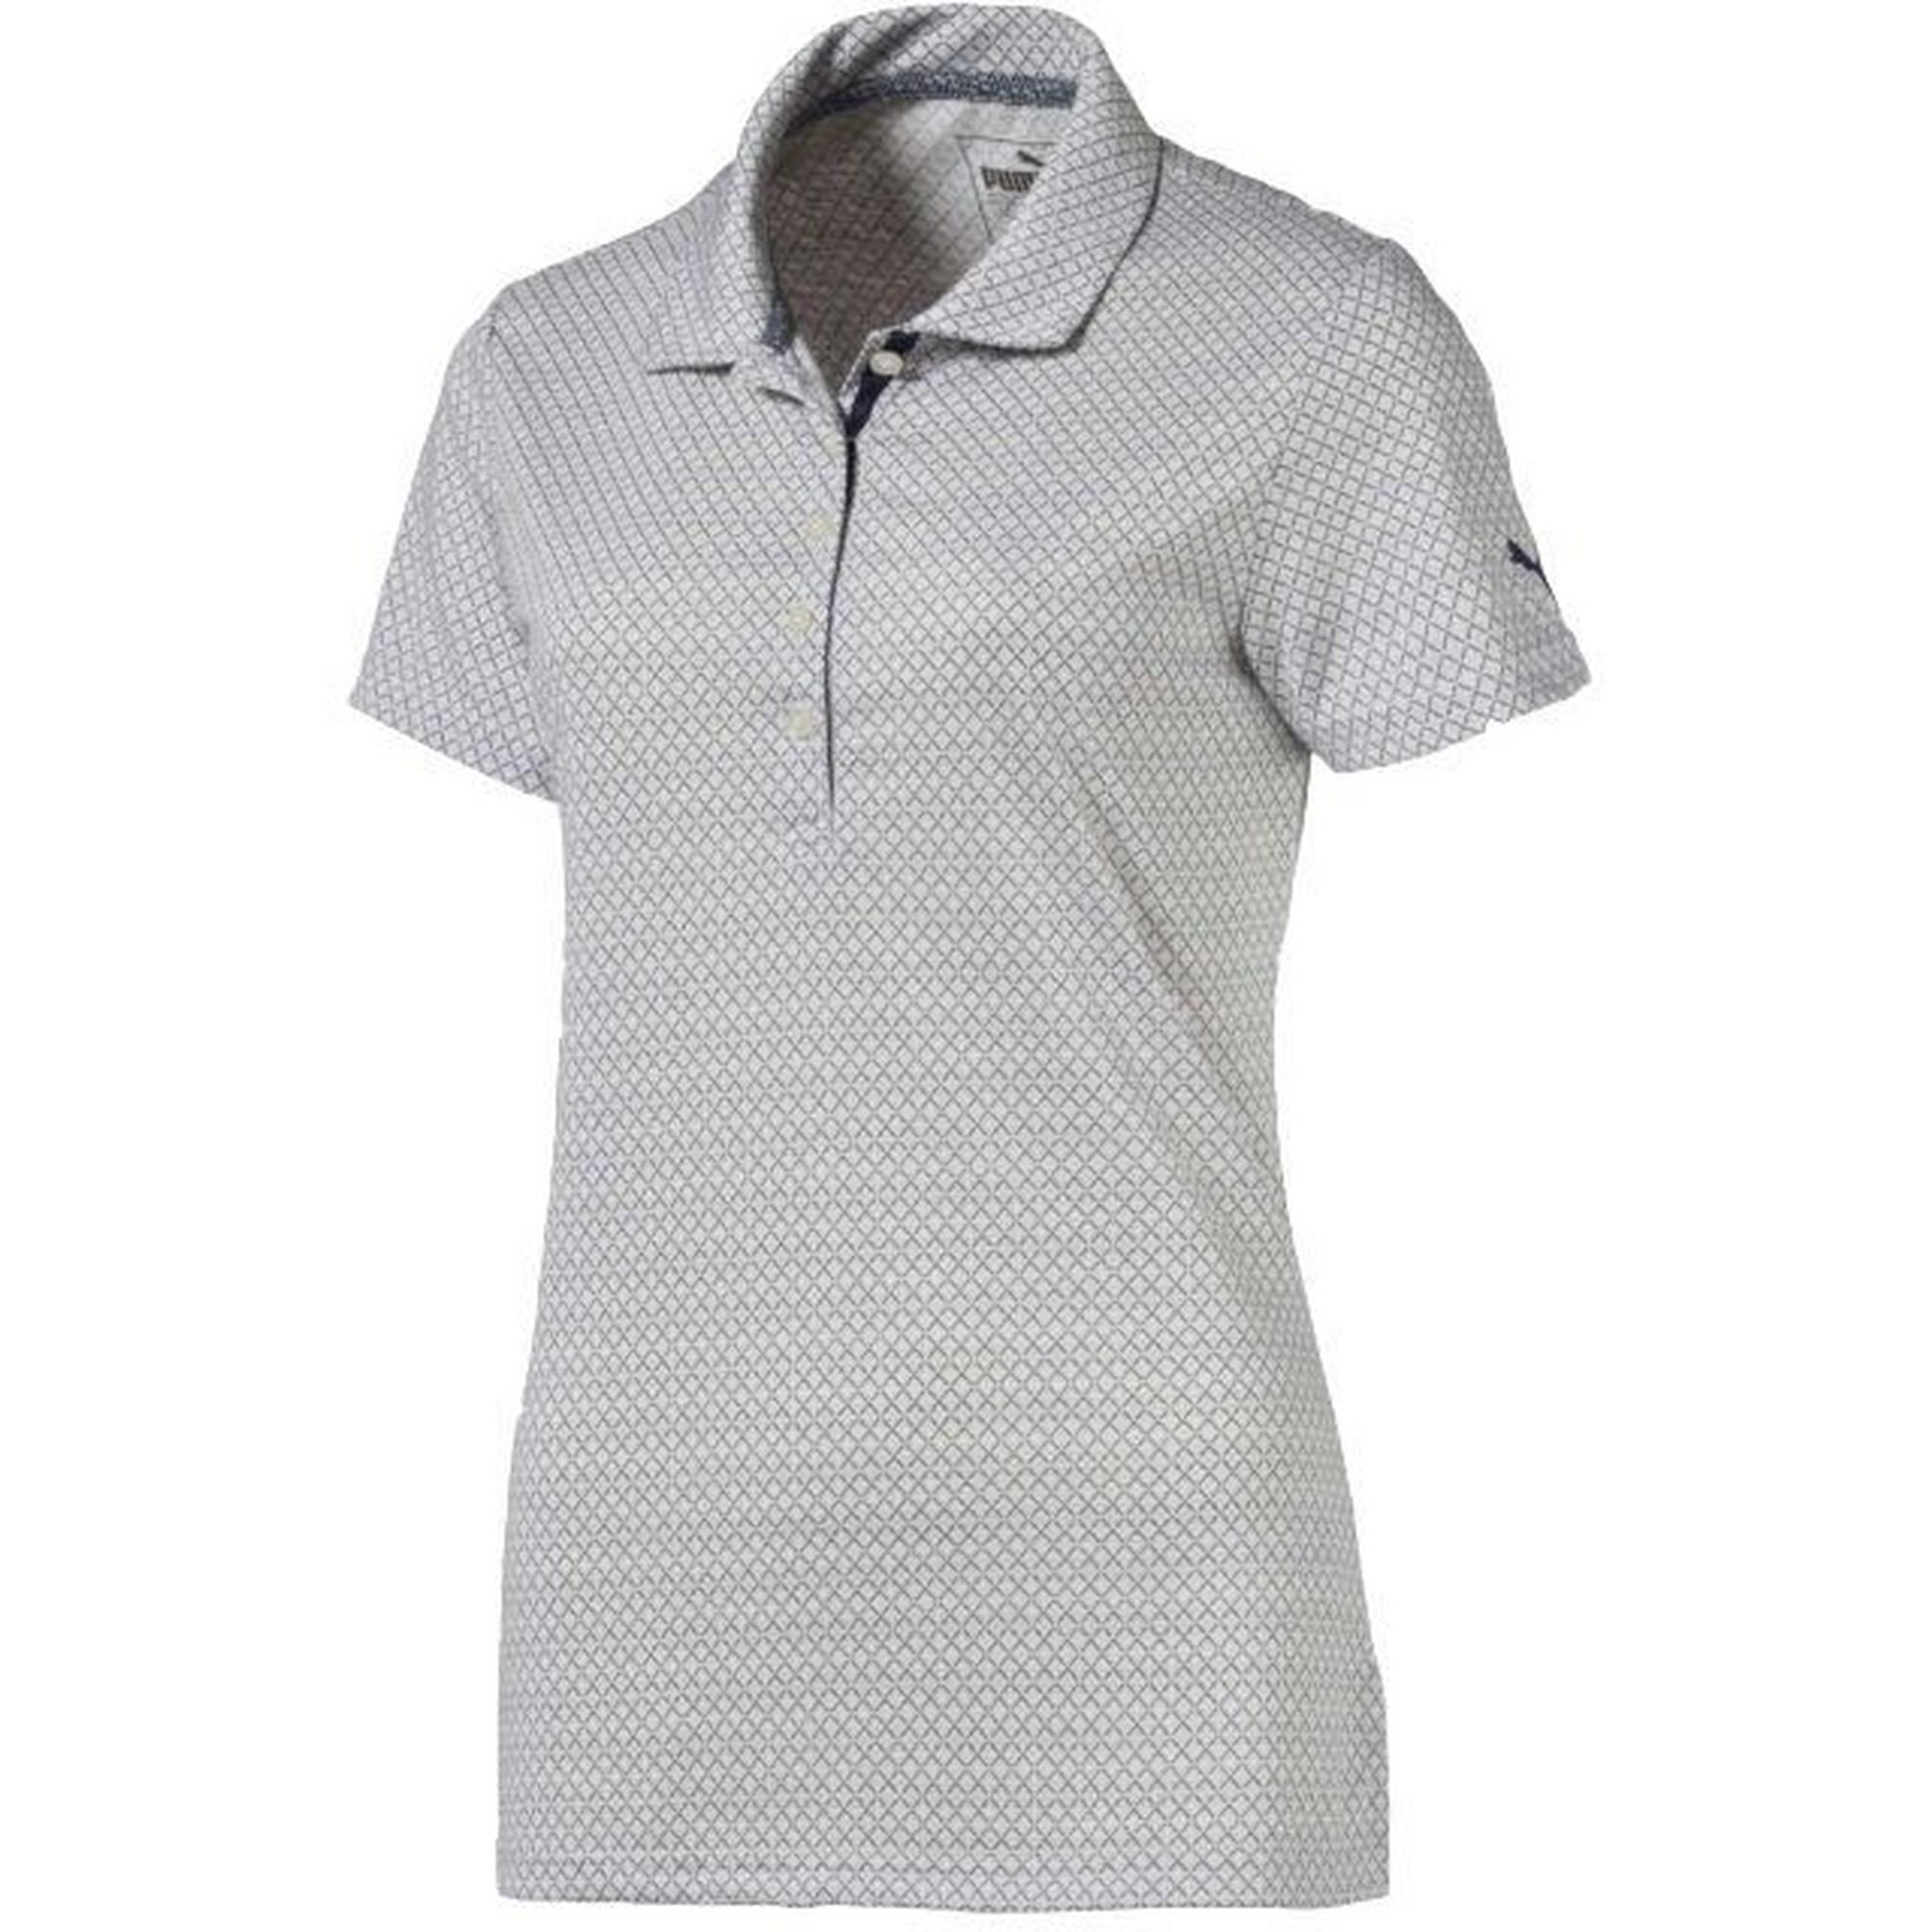 Women's Sundays Short Sleeve Polo